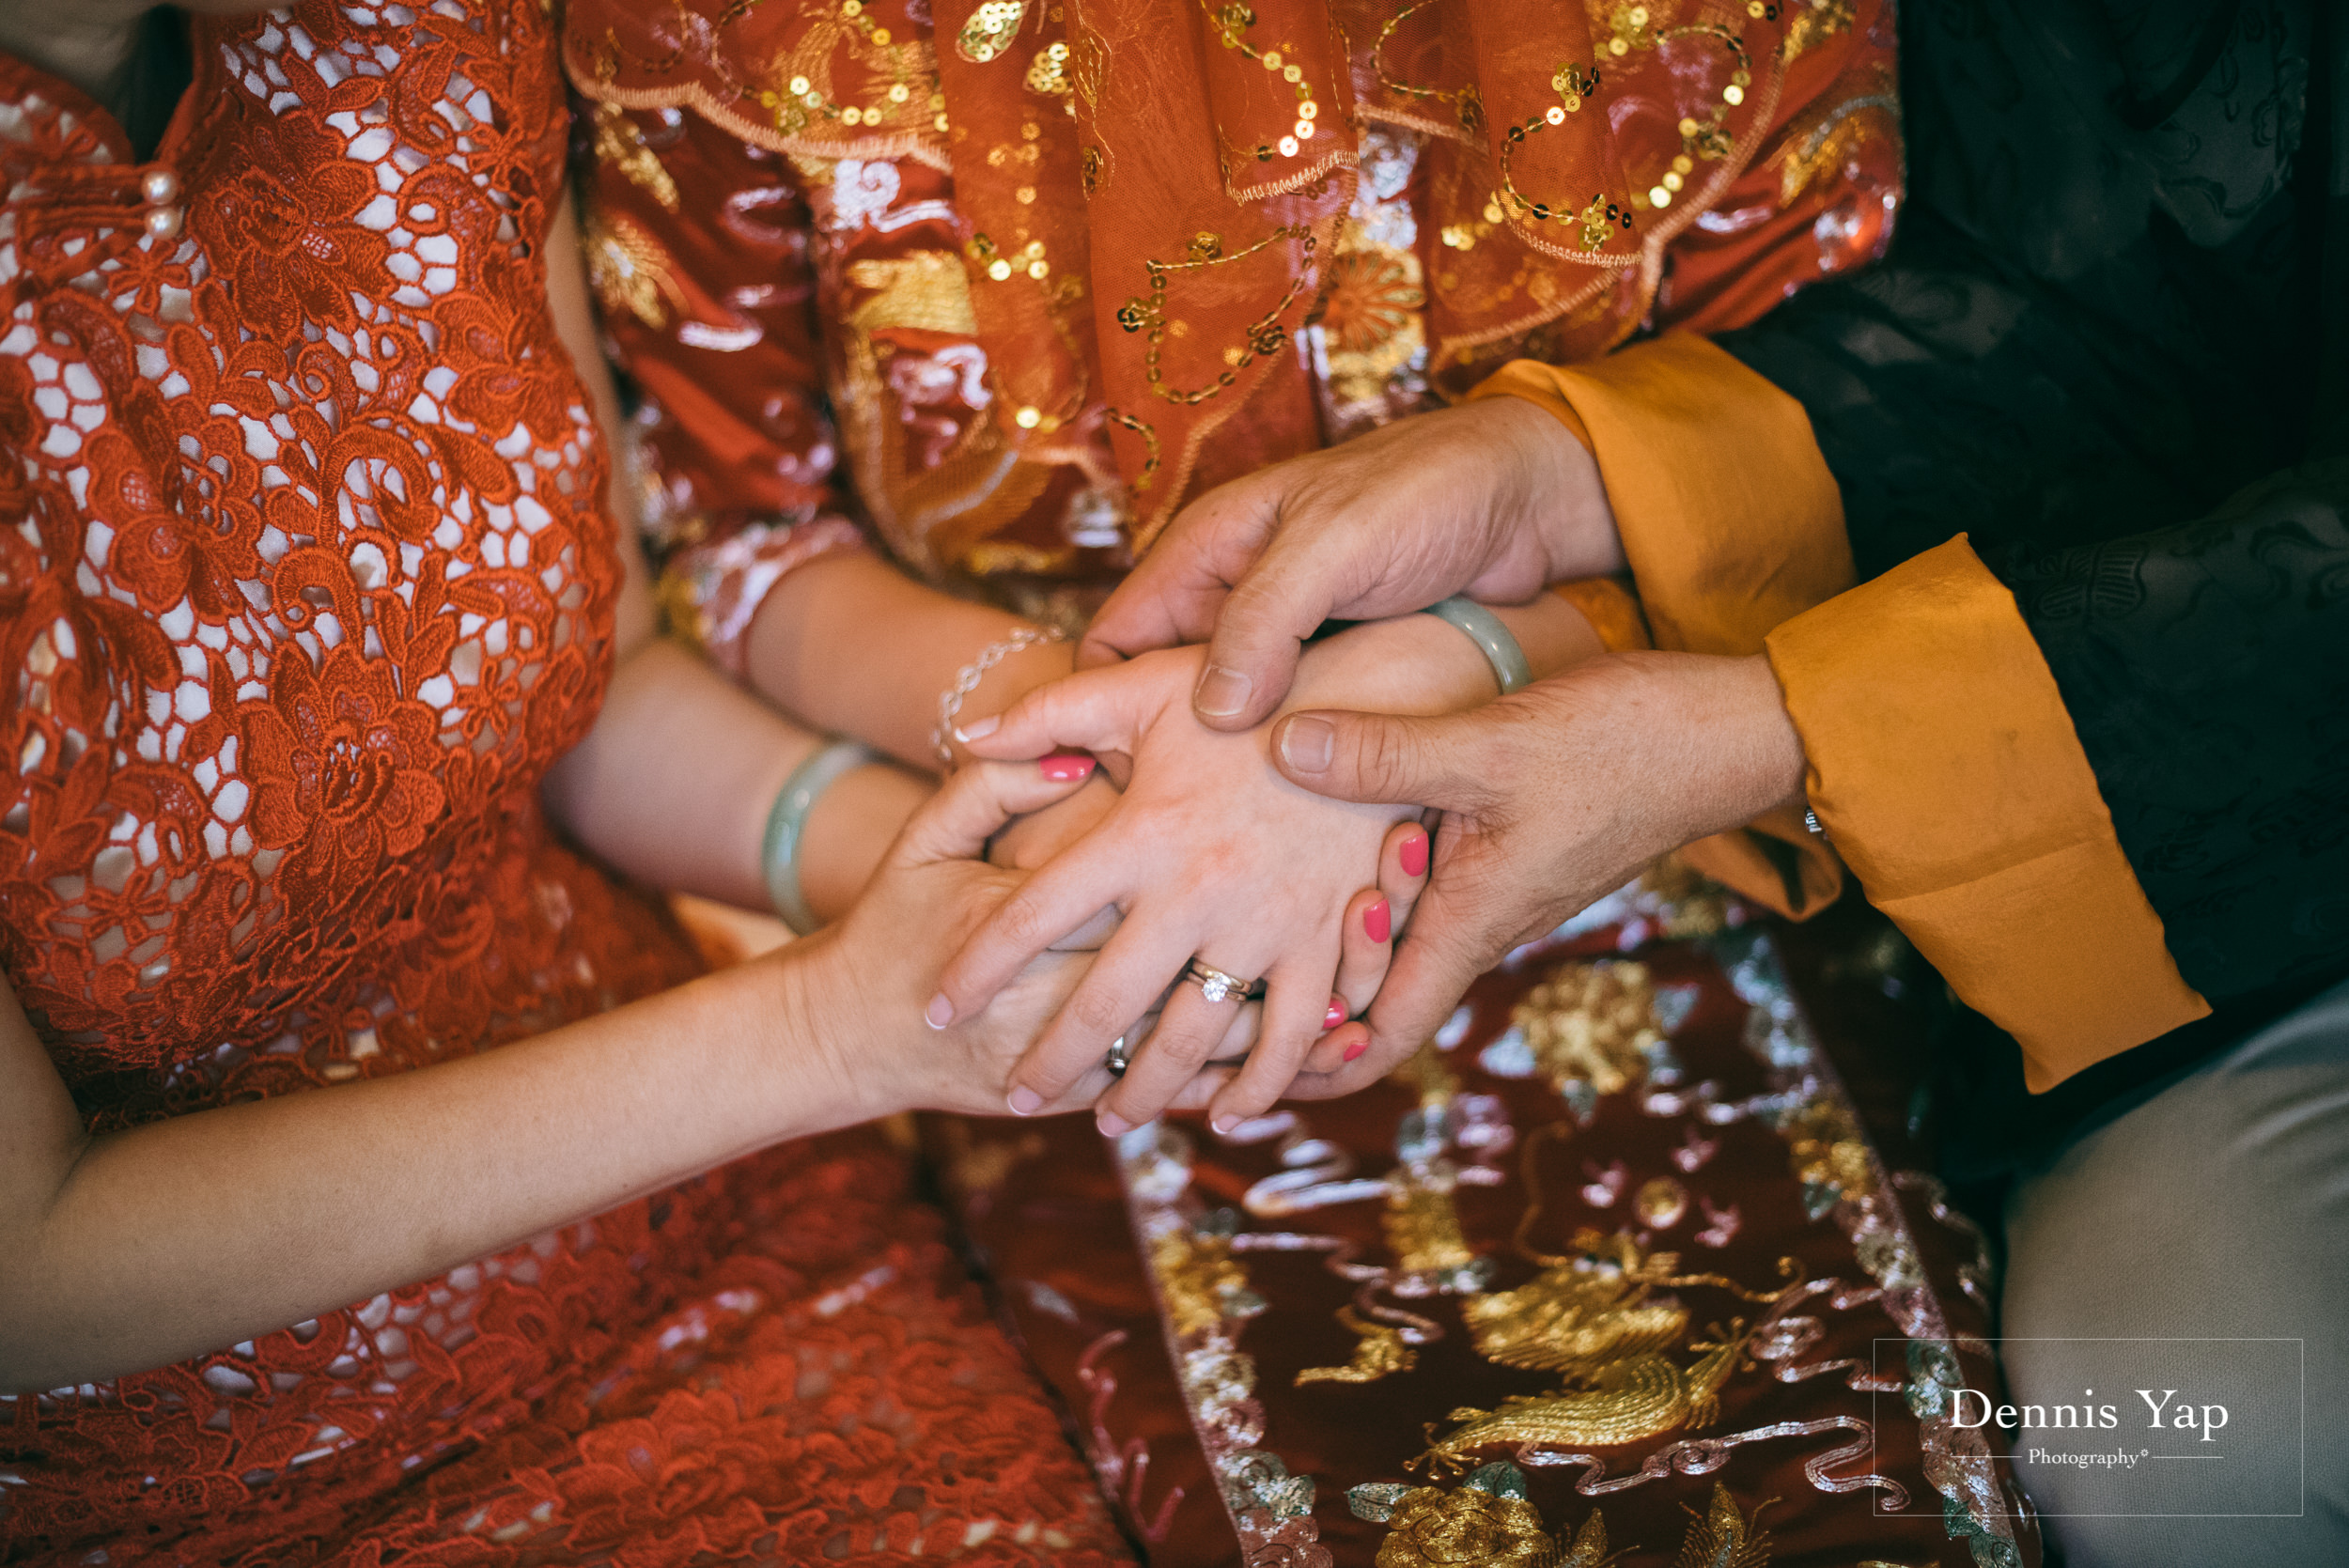 jordan amanda wedding day westin hotel kuala lumpur choe family dennis yap photography-5.jpg